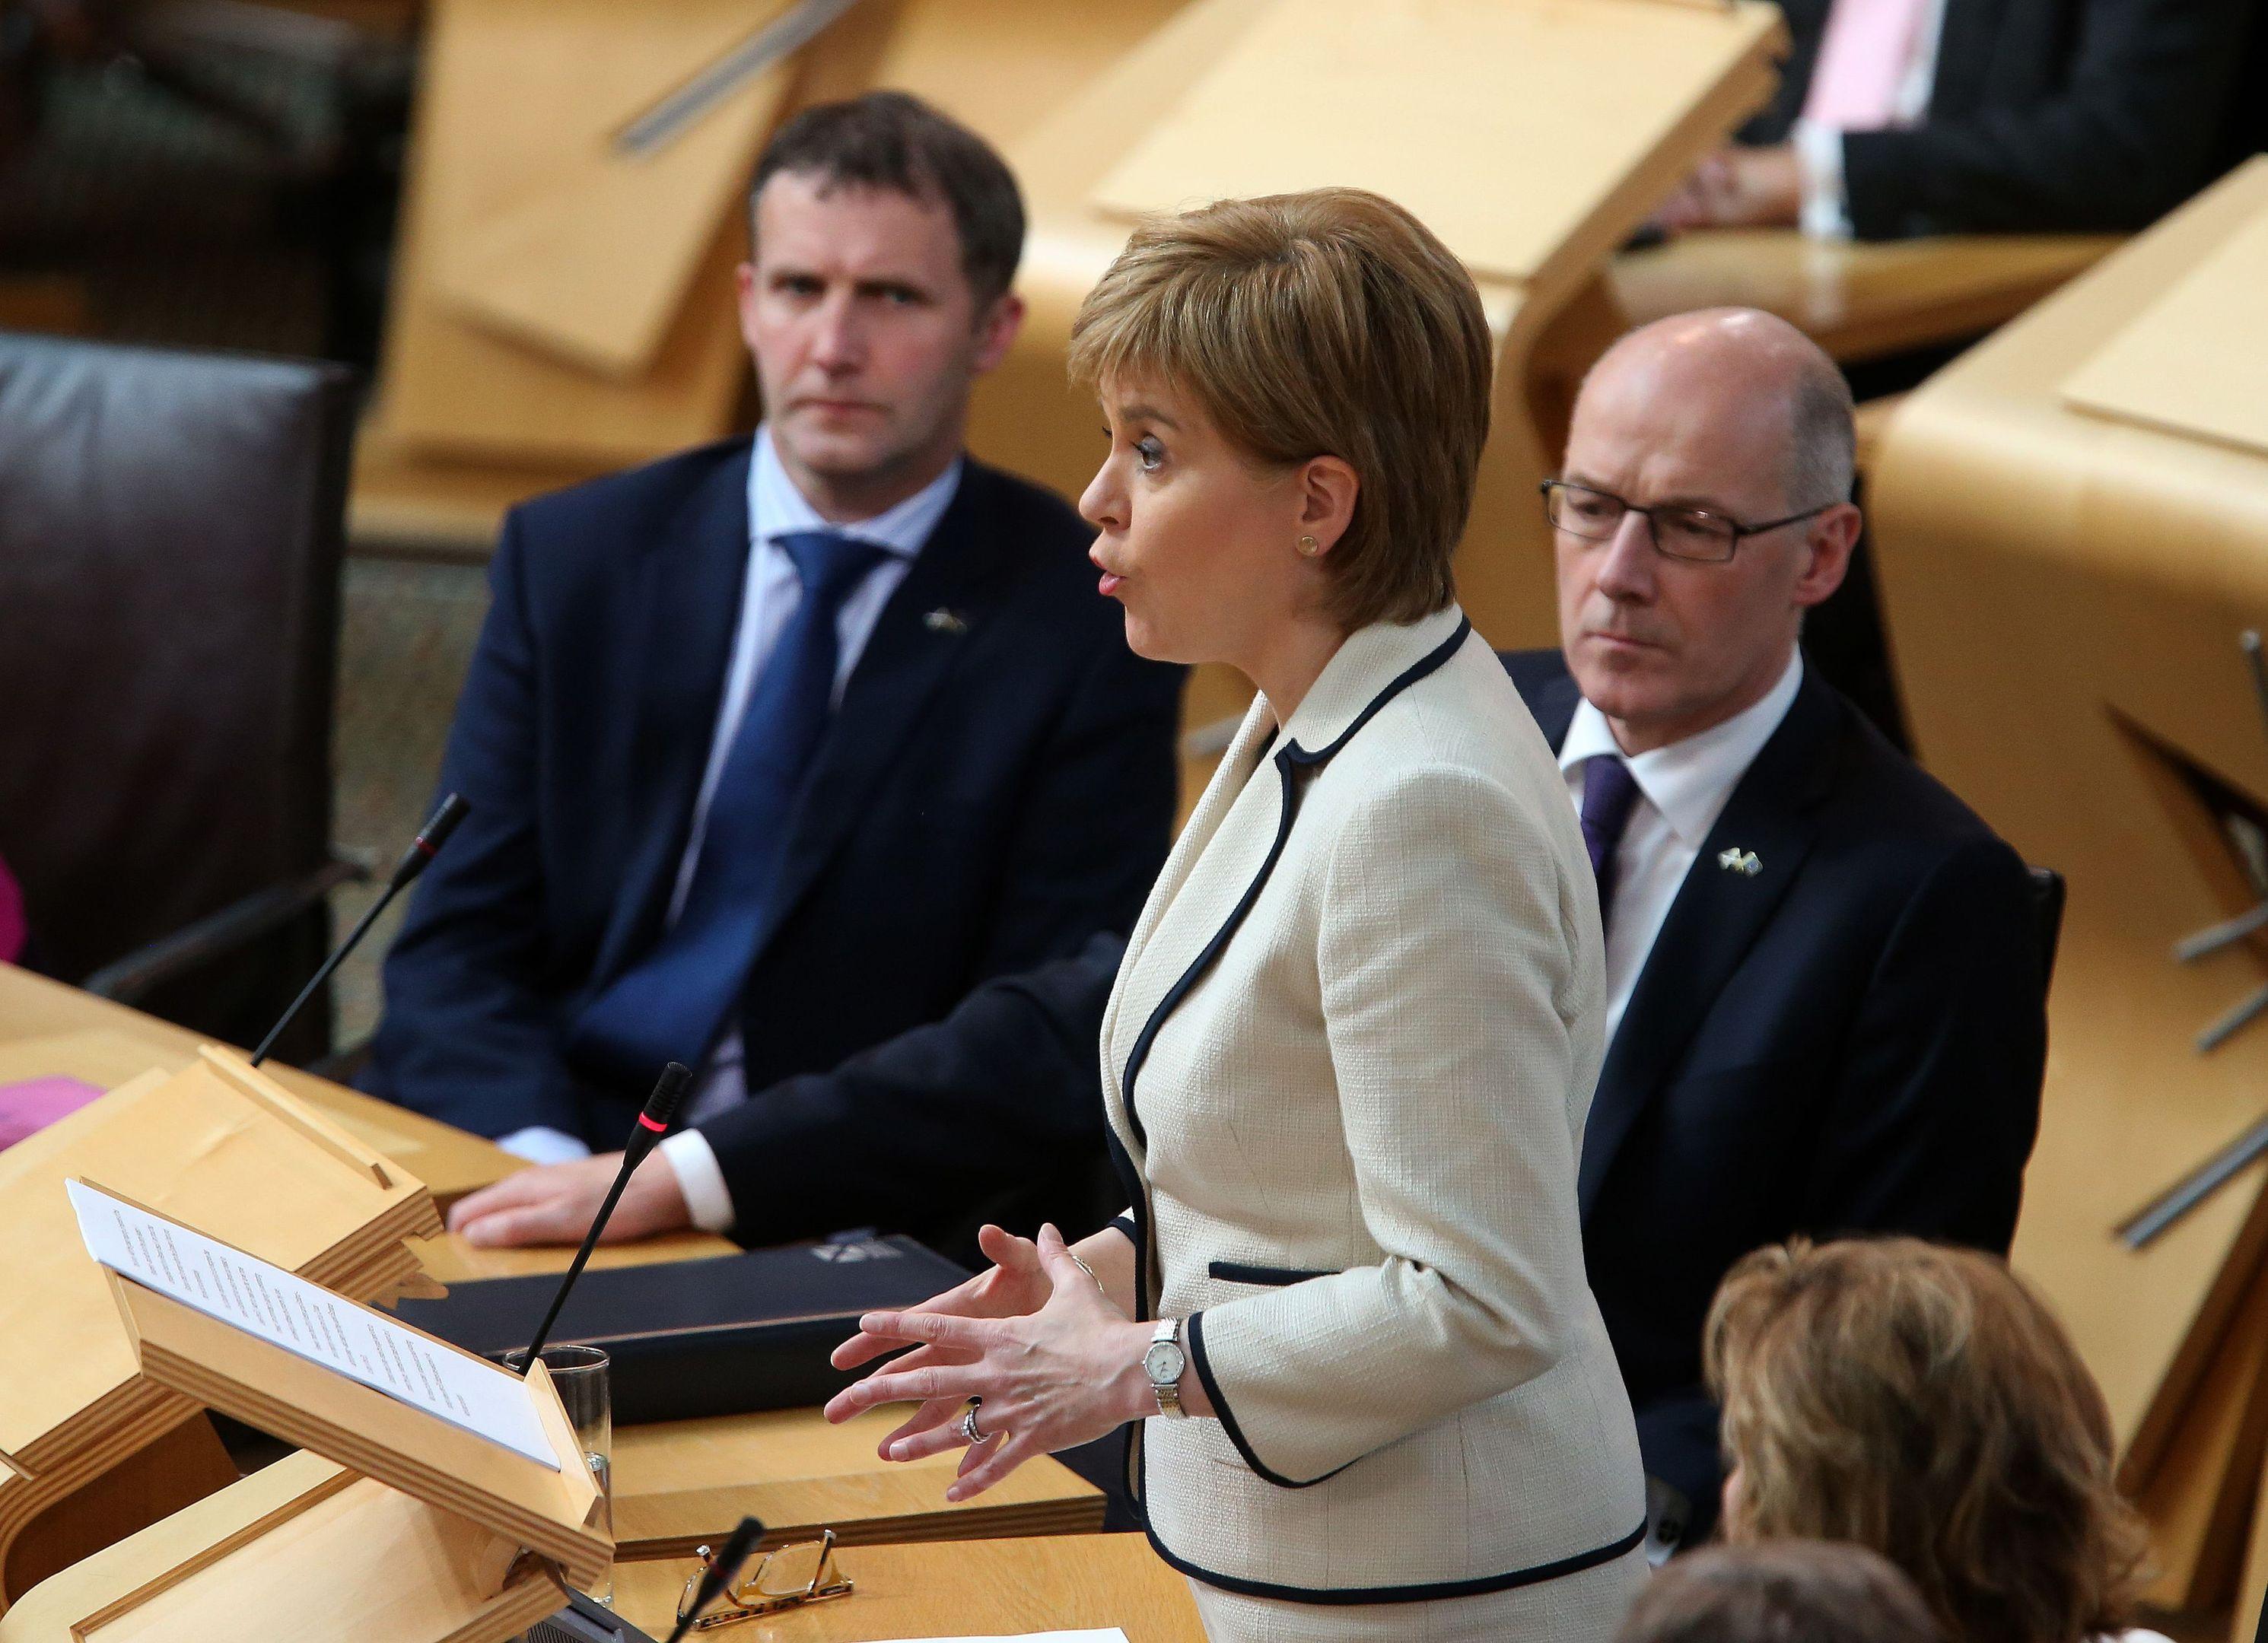 Nicola Sturgeon addresses MSPs at Holyrood in the emergency debate.